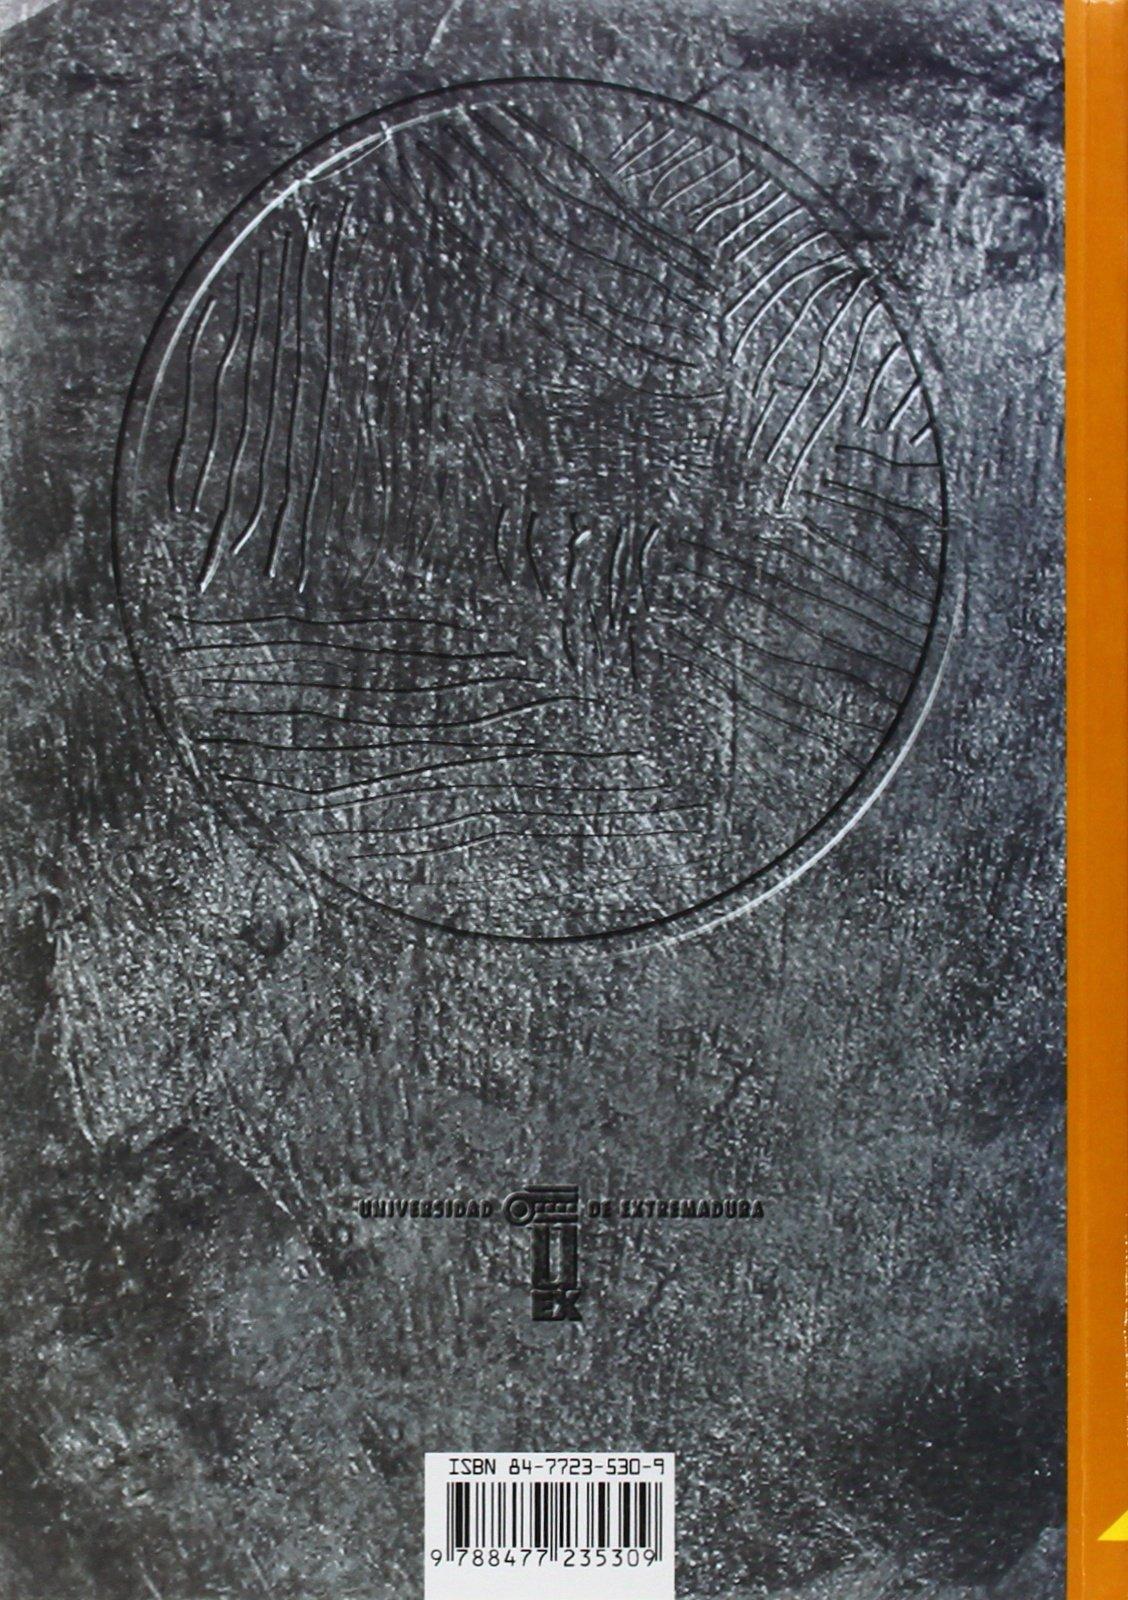 METALURGIA GENERAL PRACTICA (MANUALES UEX, 35): MARINA MARTINEZ G. - CARLOS J. DURAN V. - CARMEN FERNANDEZ G.: 9788477235309: Amazon.com: Books